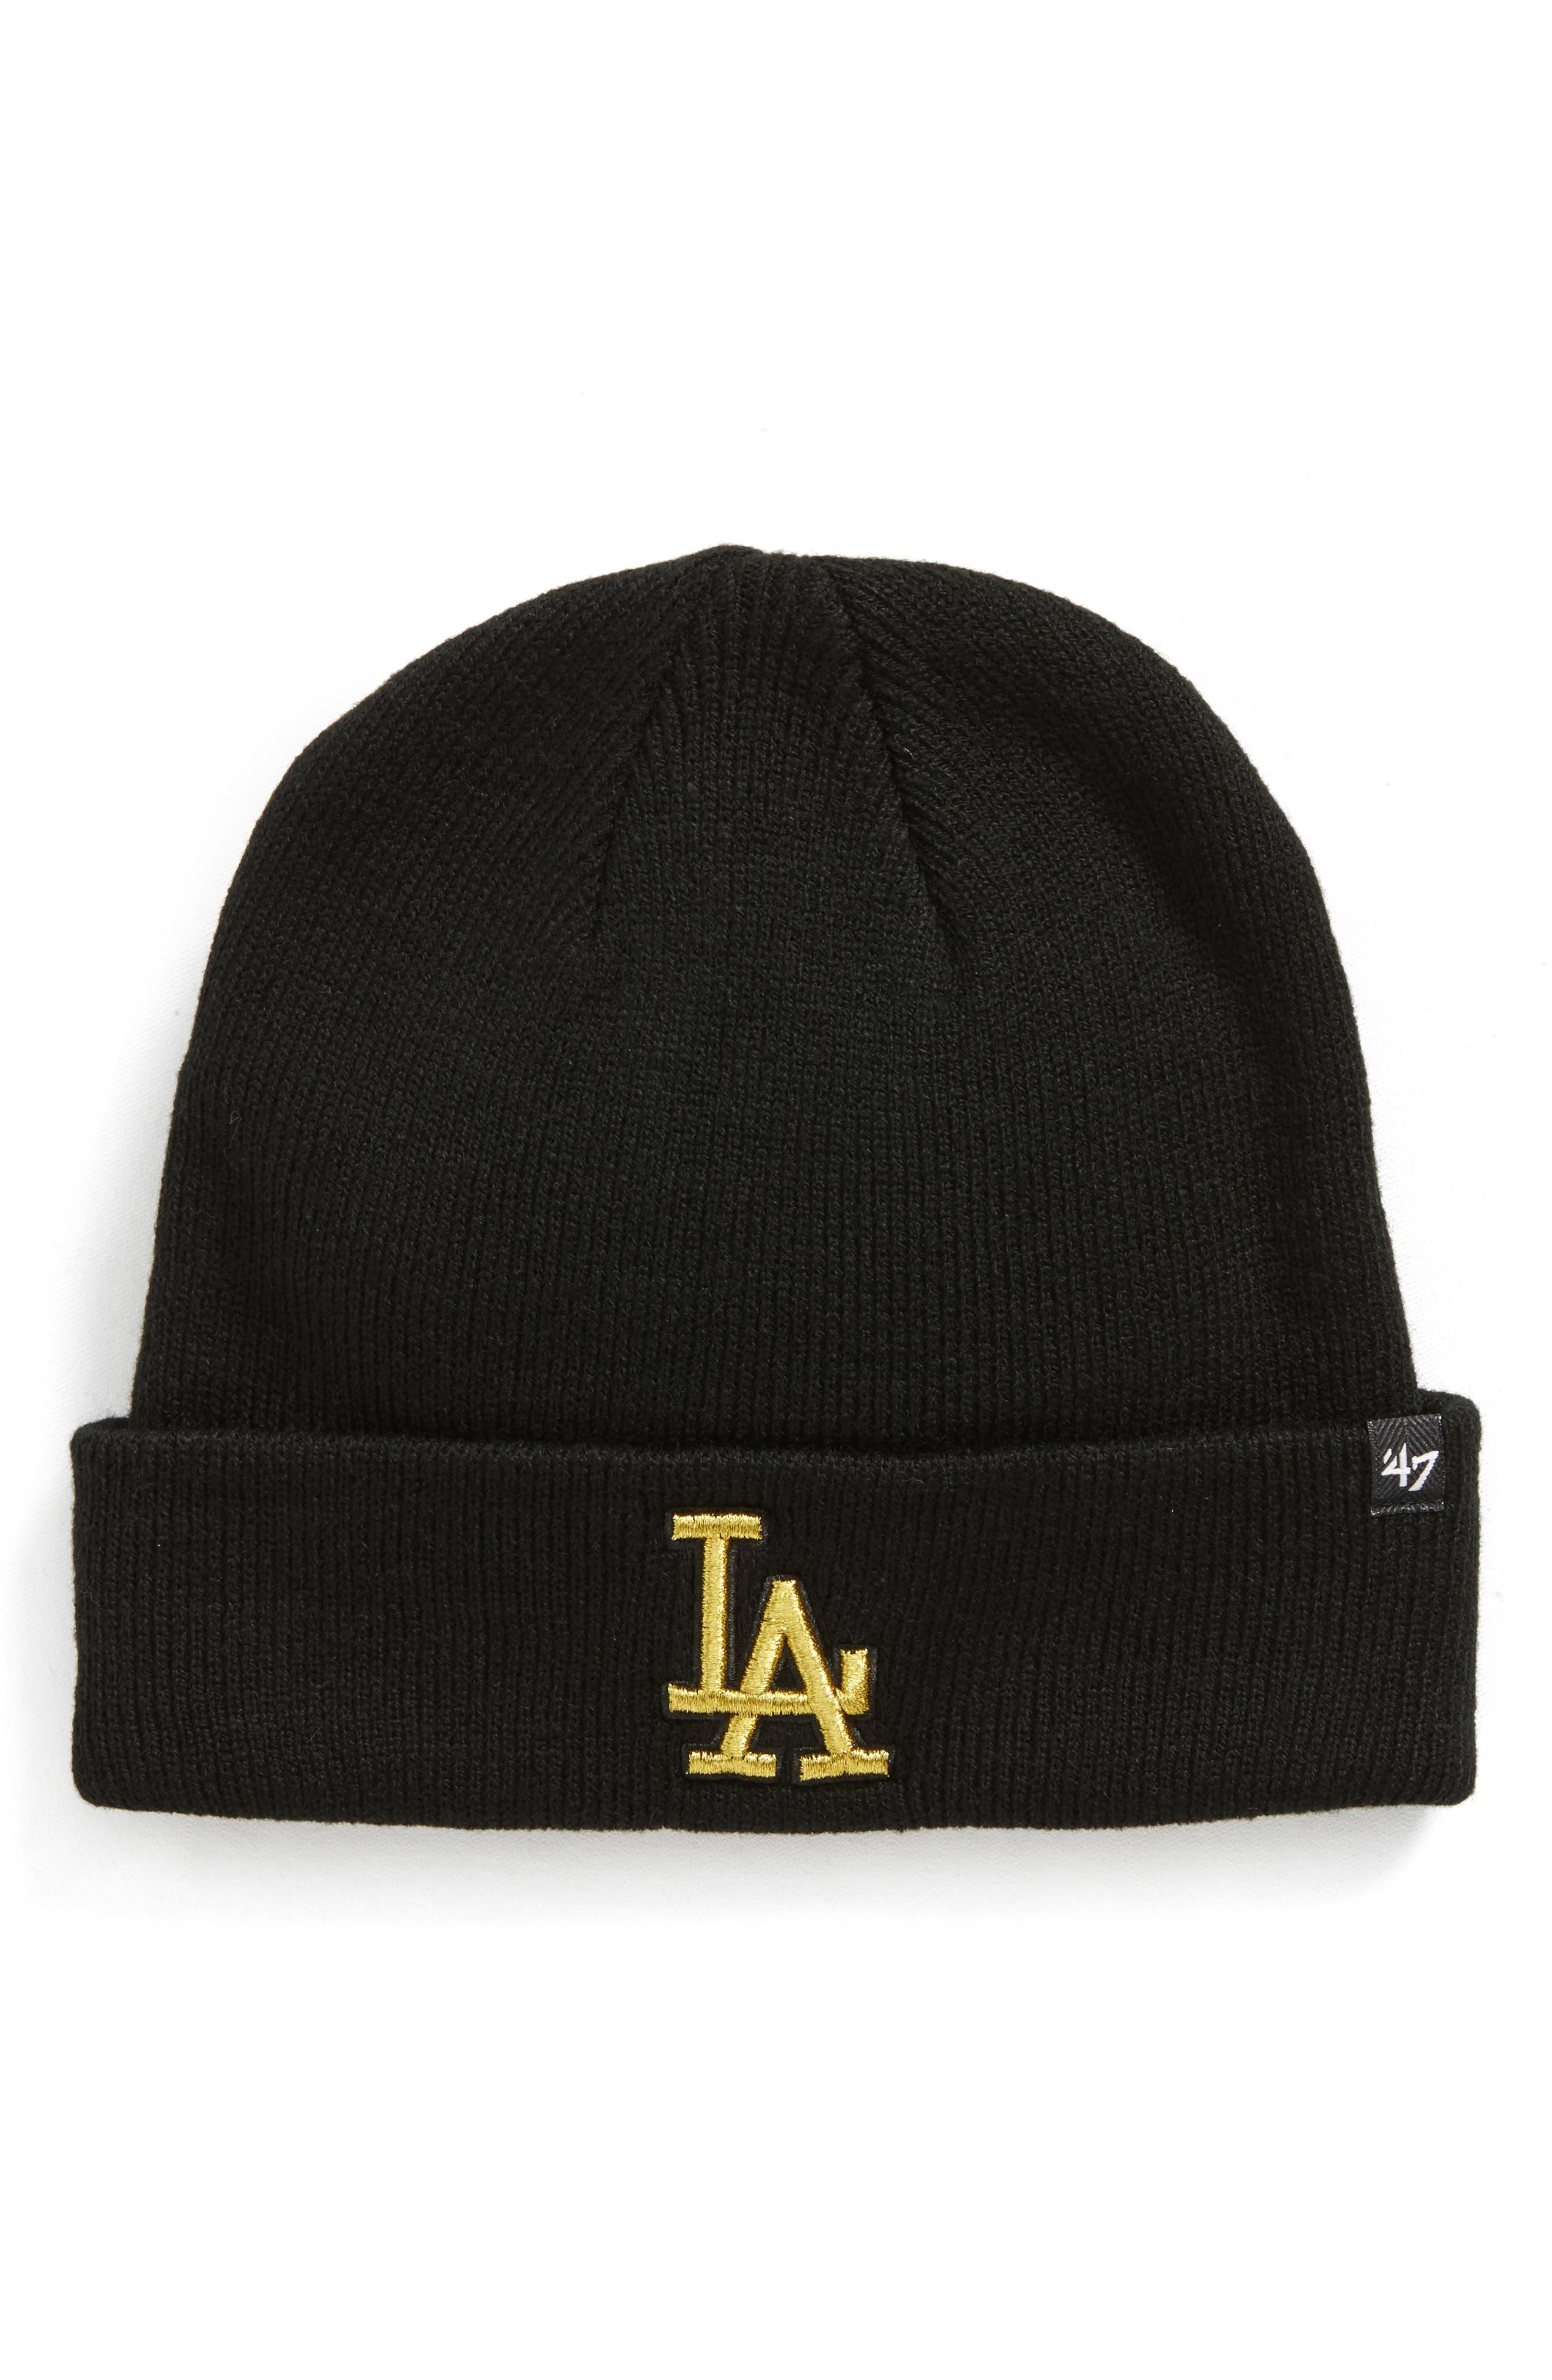 Alternate Image 1 Selected - '47 Brand Los Angeles Dodgers Metallic Beanie